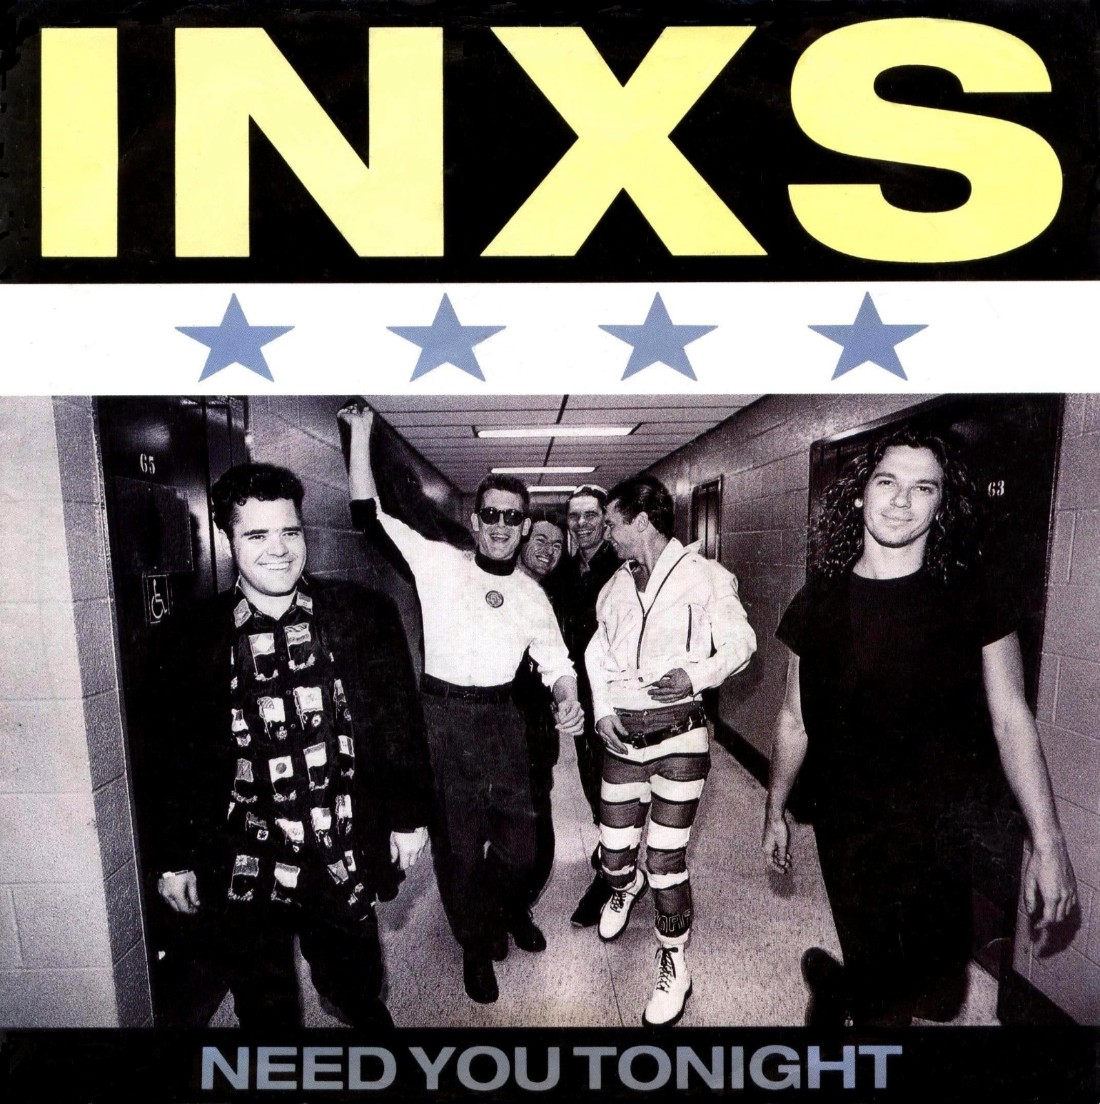 Inxs need you tonight chords